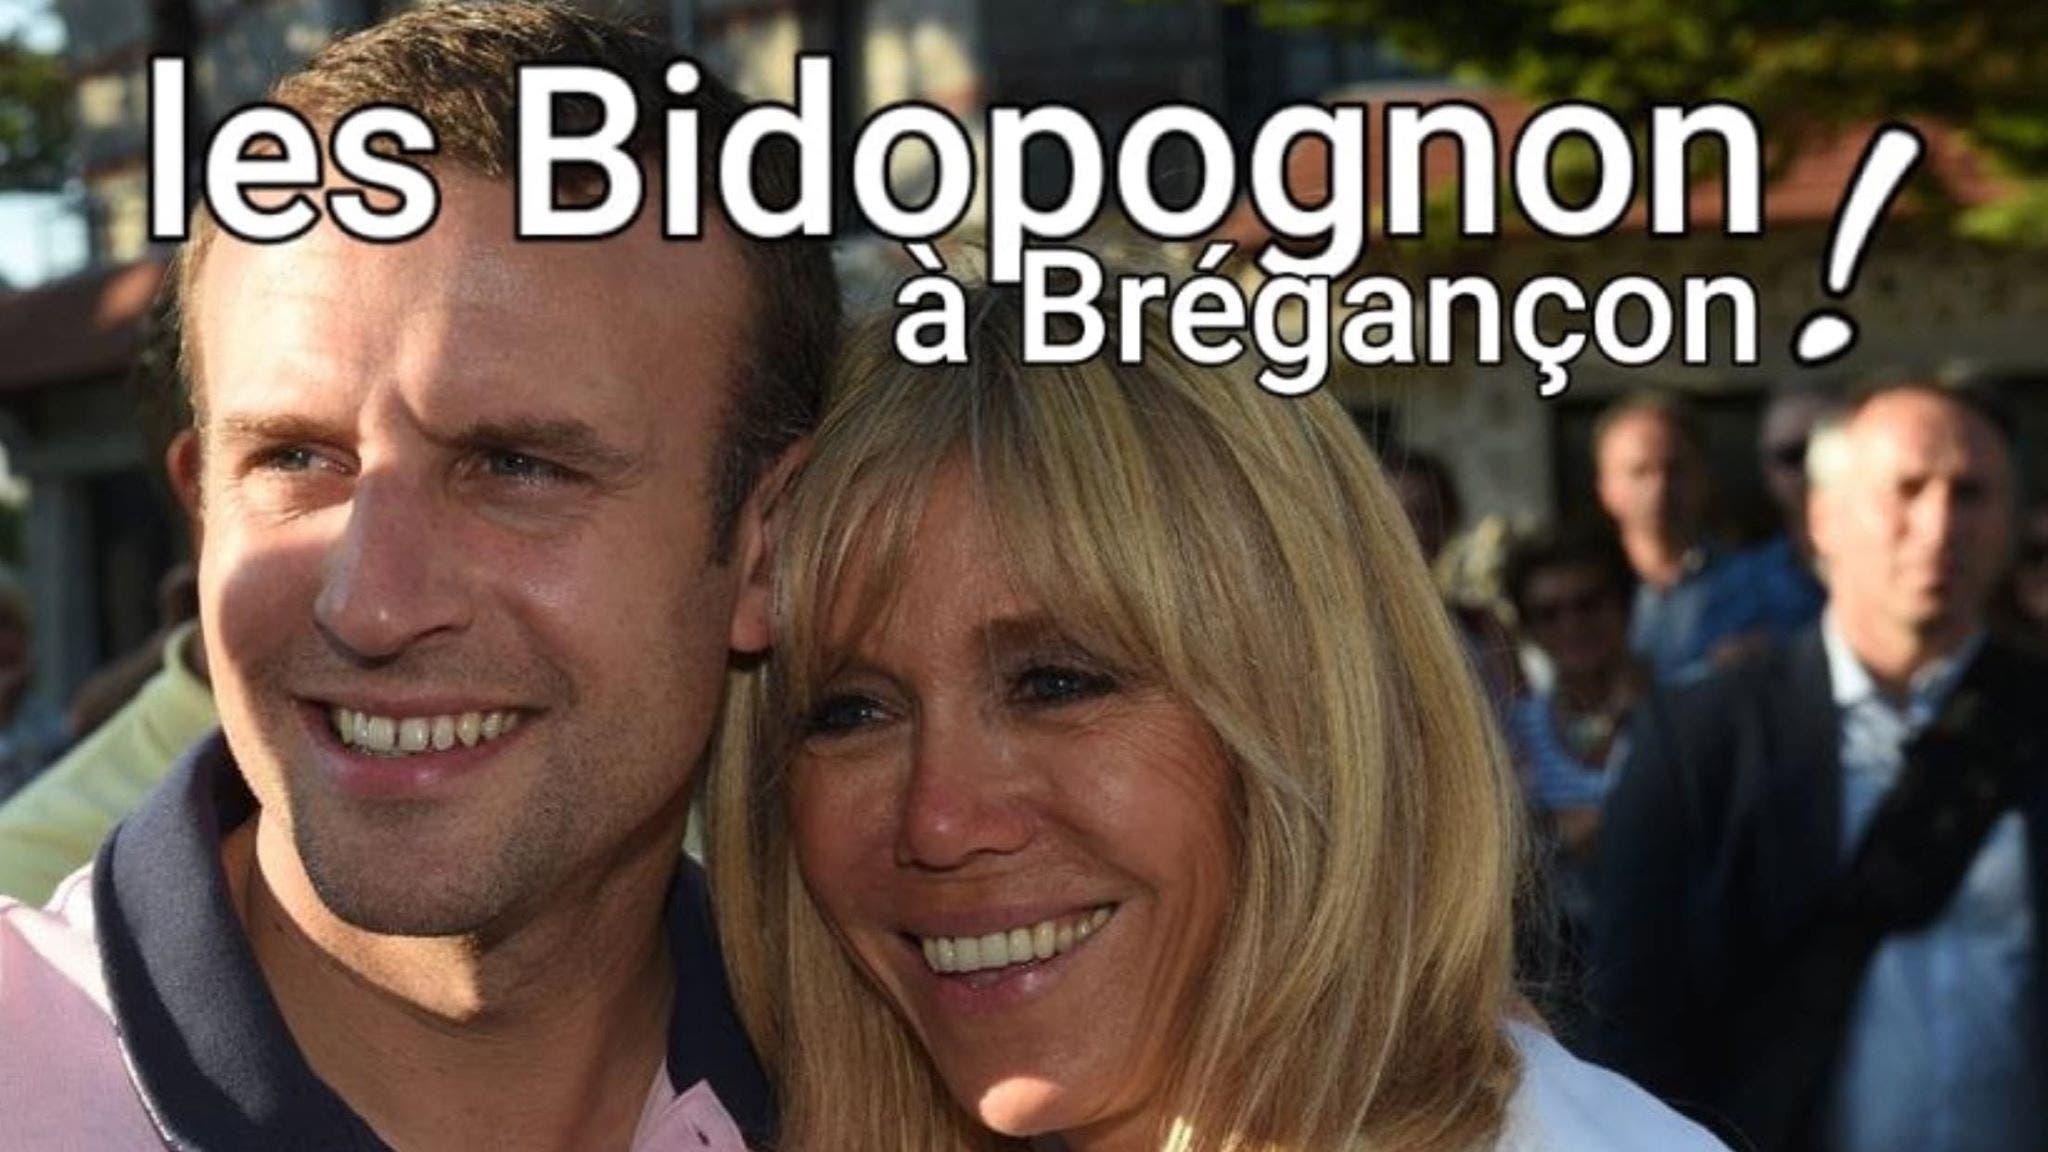 bidopognon